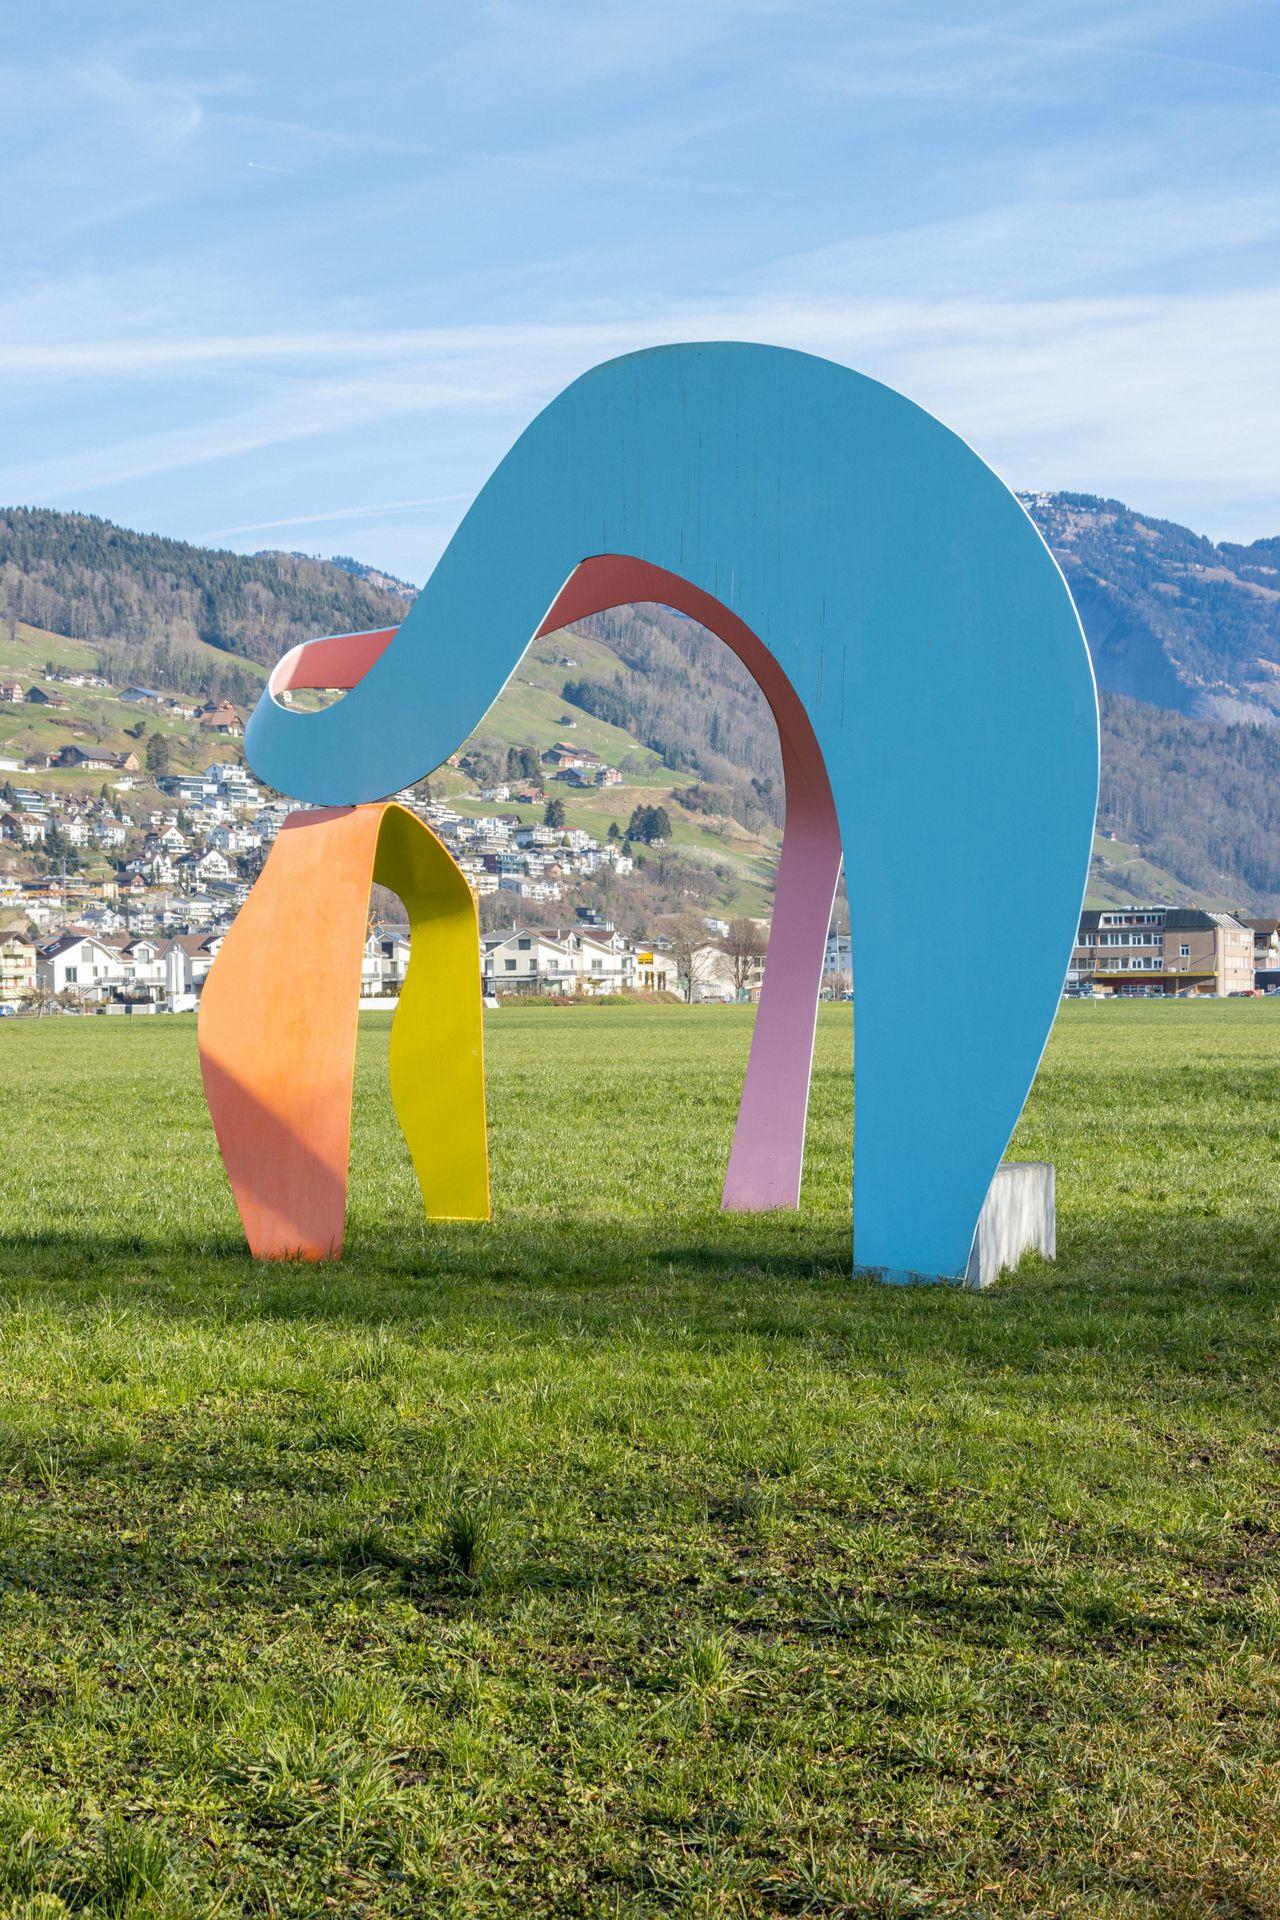 Ennetbürgen Sculpture Park